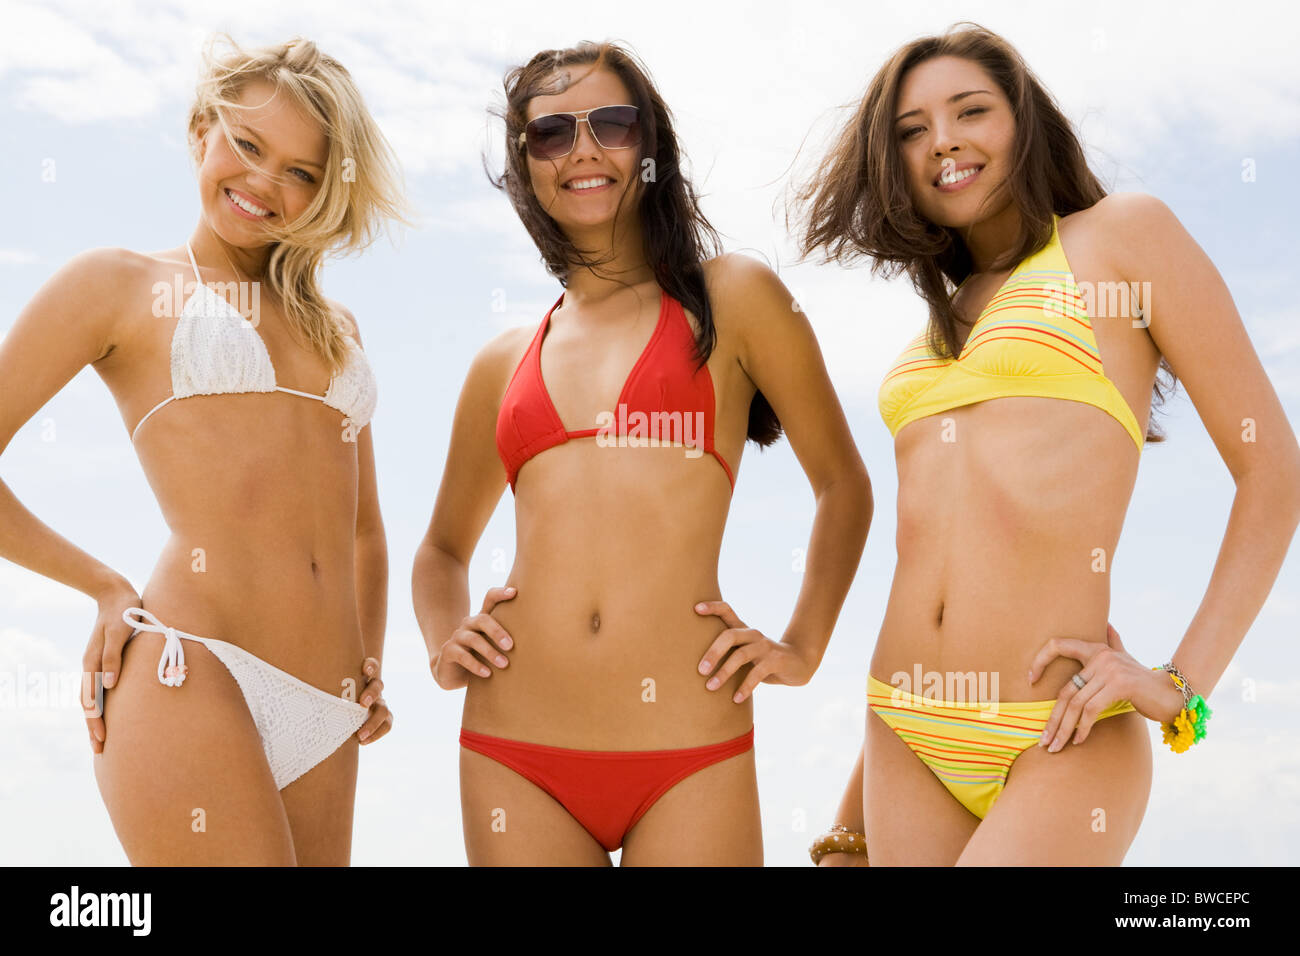 Retrato Bikini La Tres En Sonriendo Ante Slim De Chicas Cámara 8OnPwk0